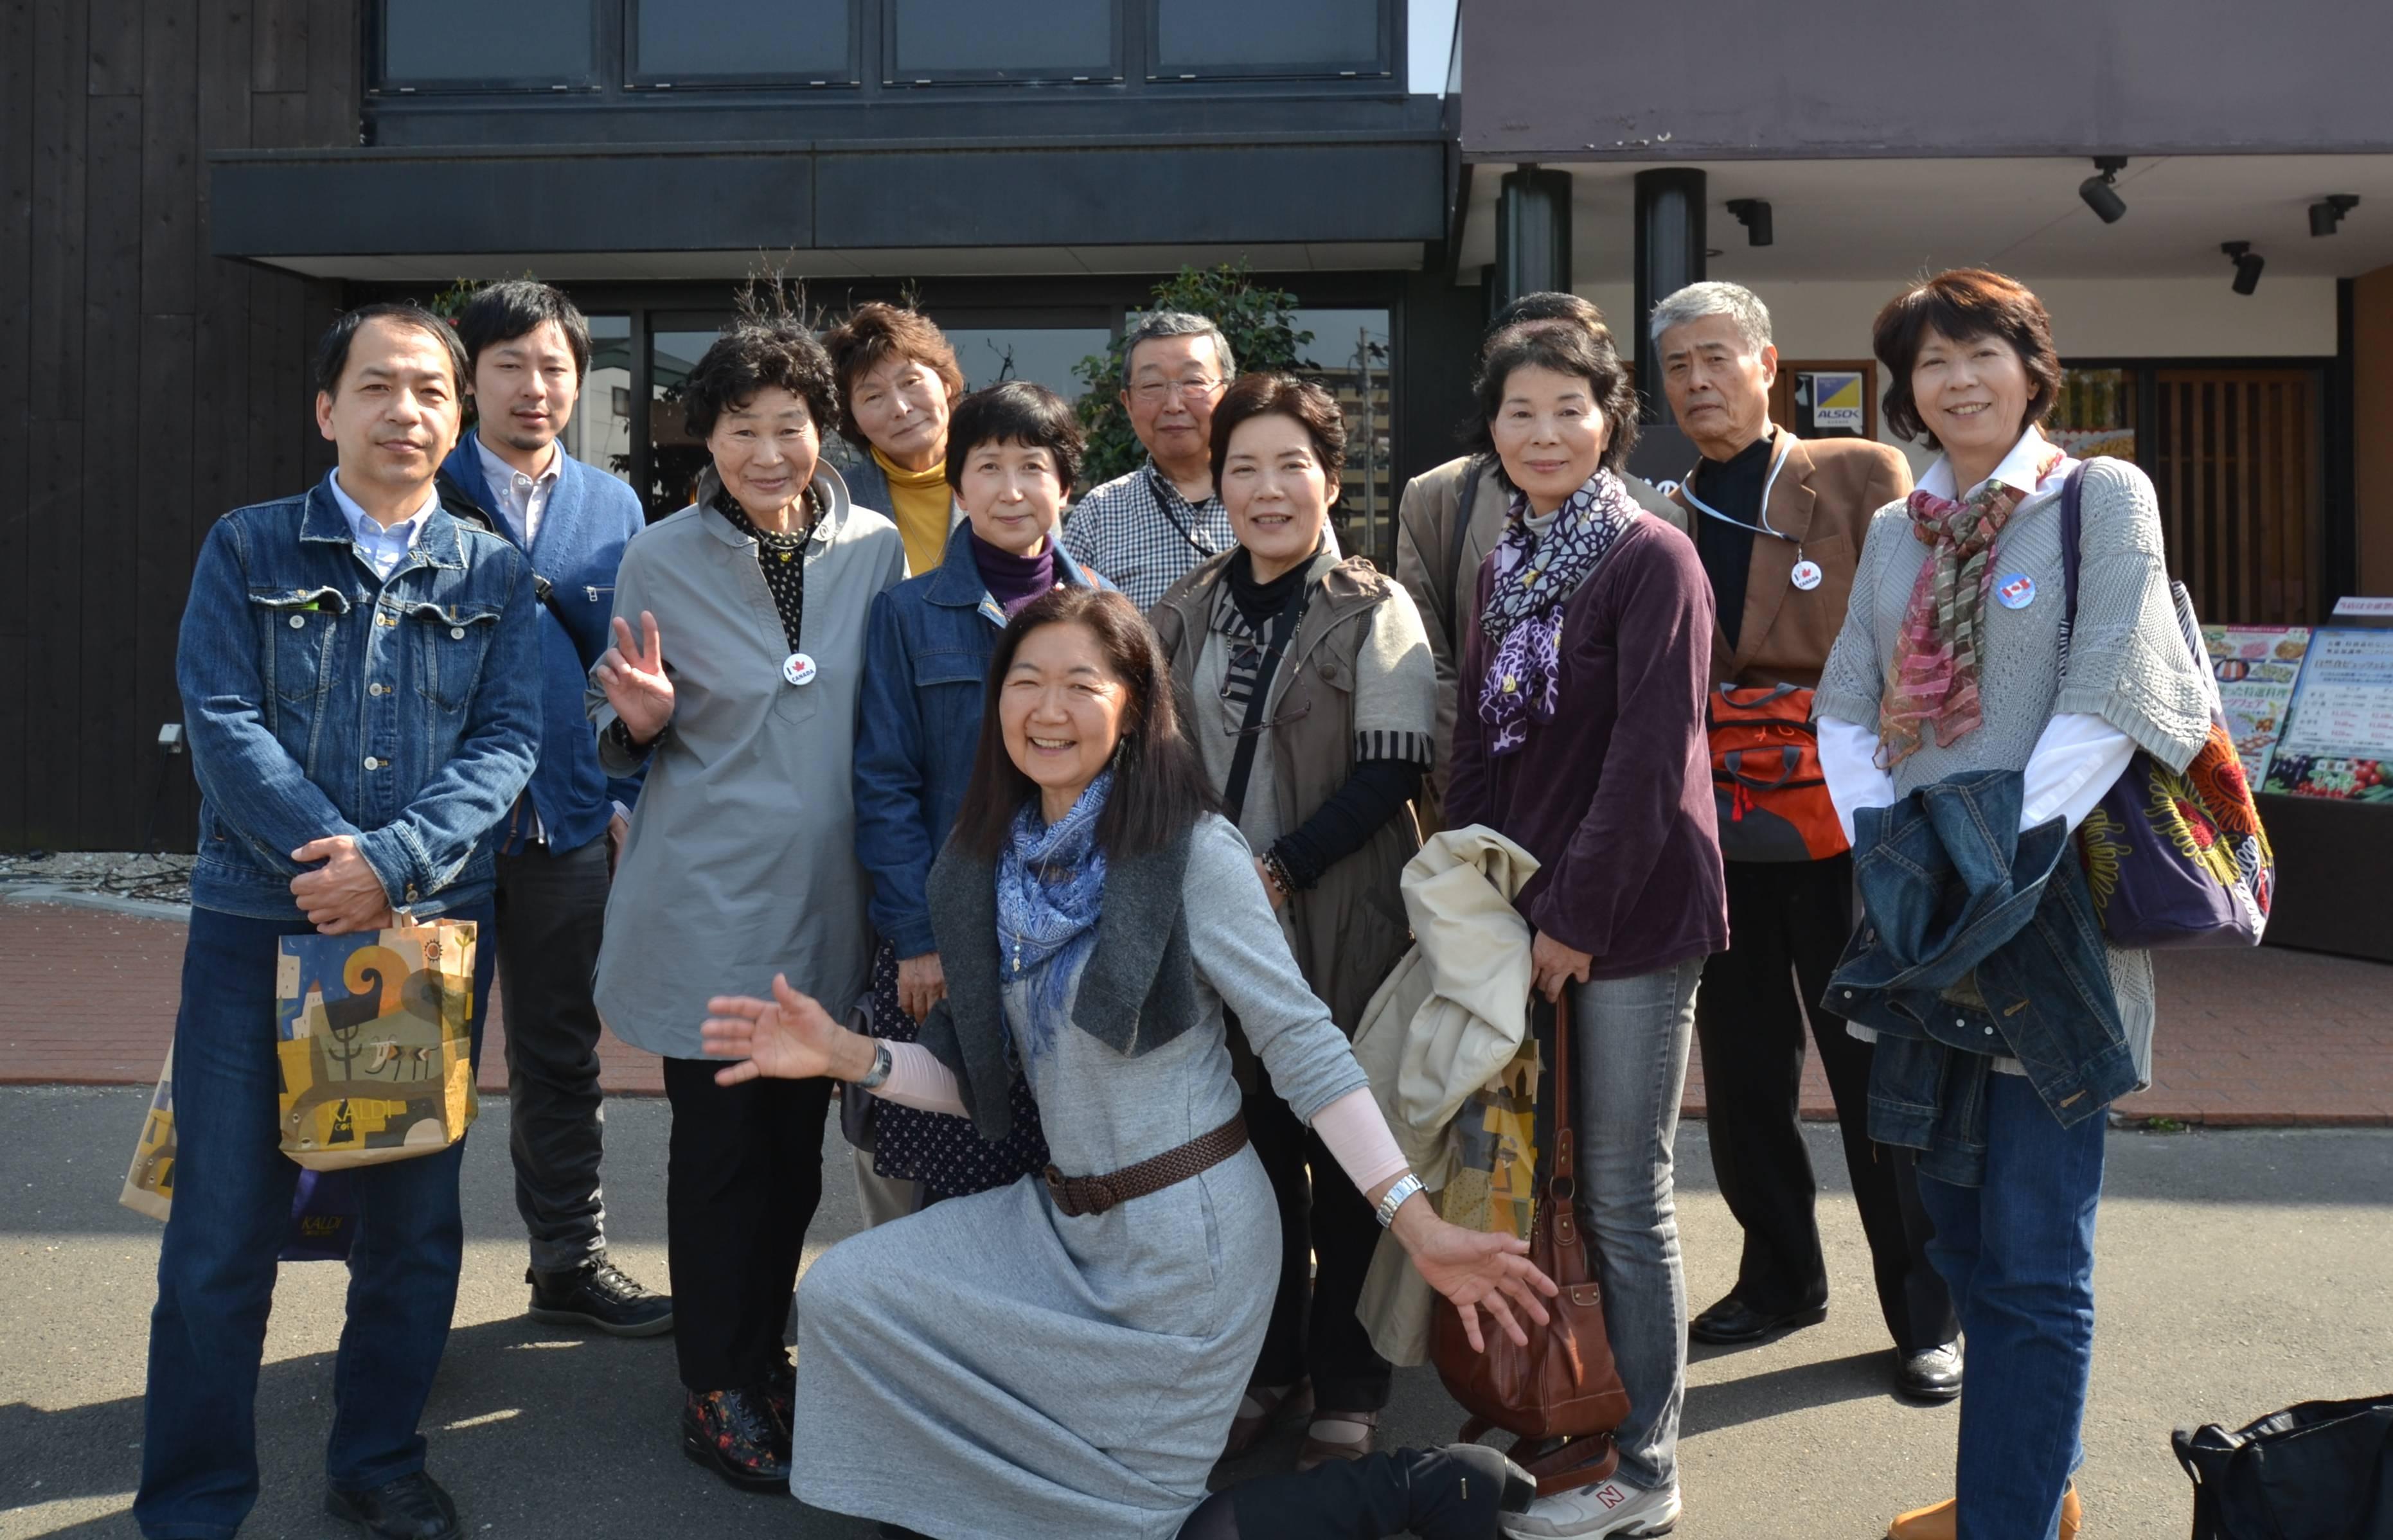 sendai daruma project volunteers linda farewell.jpg